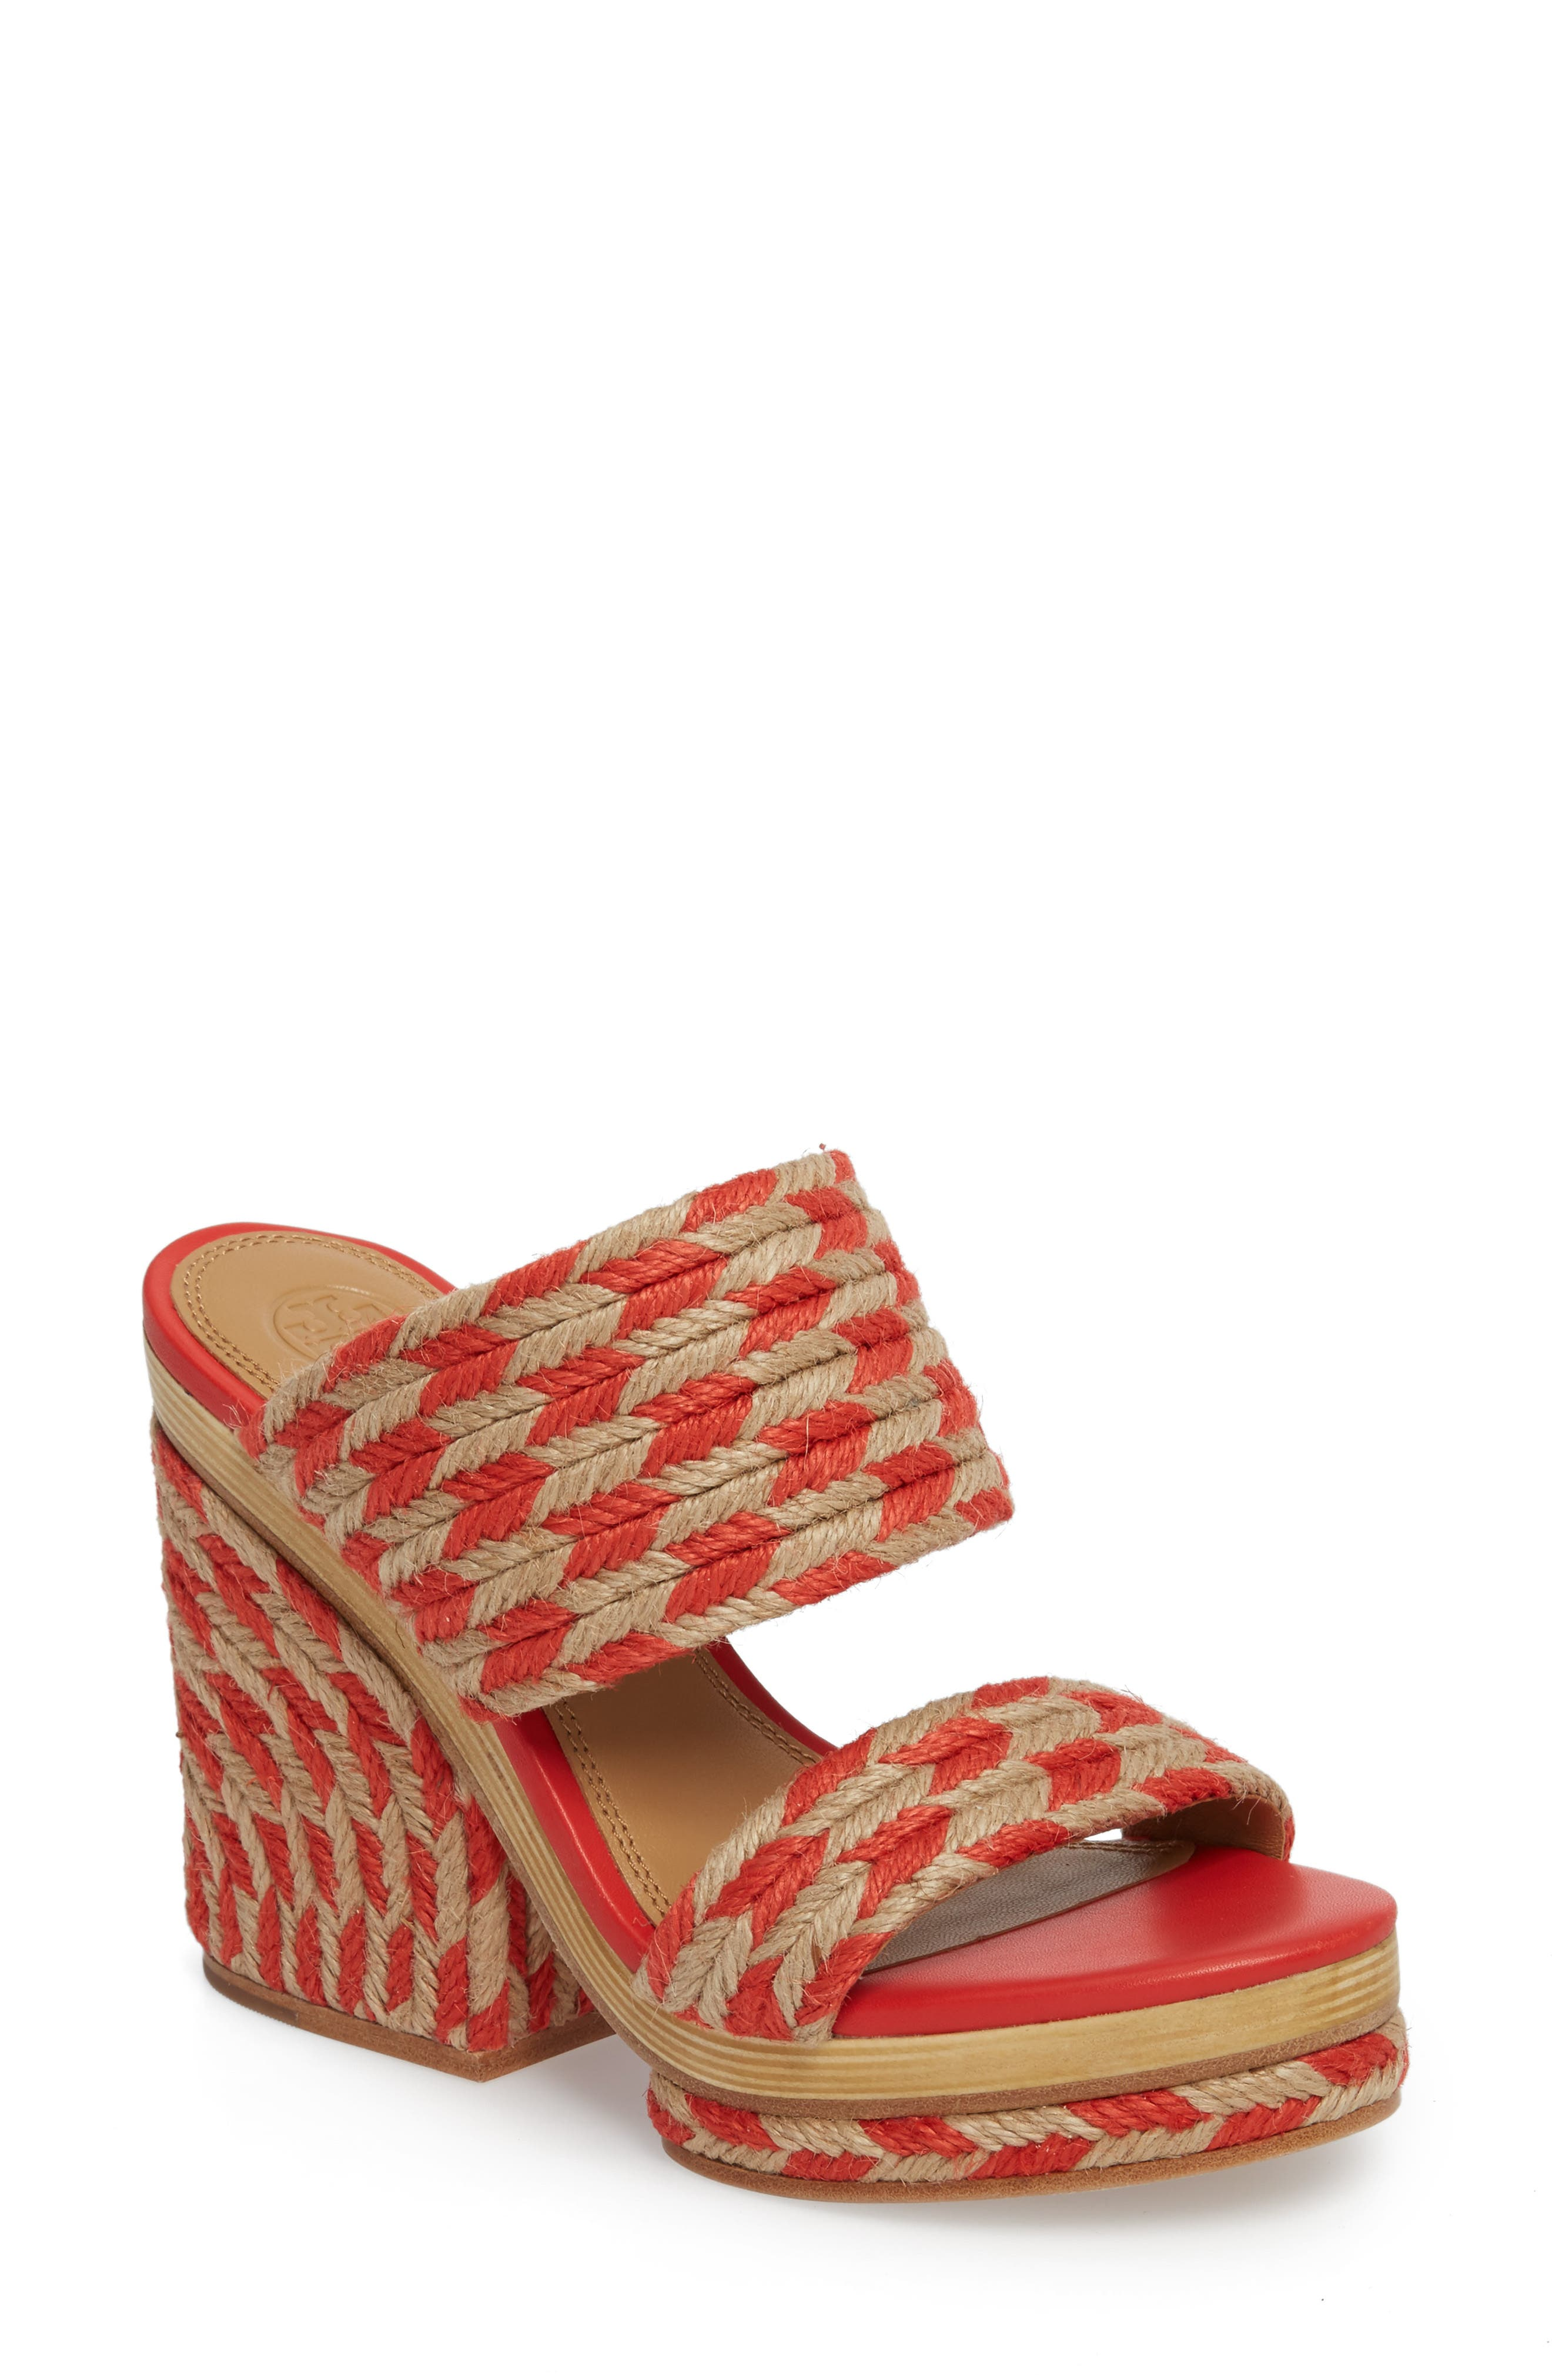 Lola Woven Platform Sandal,                             Main thumbnail 1, color,                             Poppy Orange/ Perfect Ivory